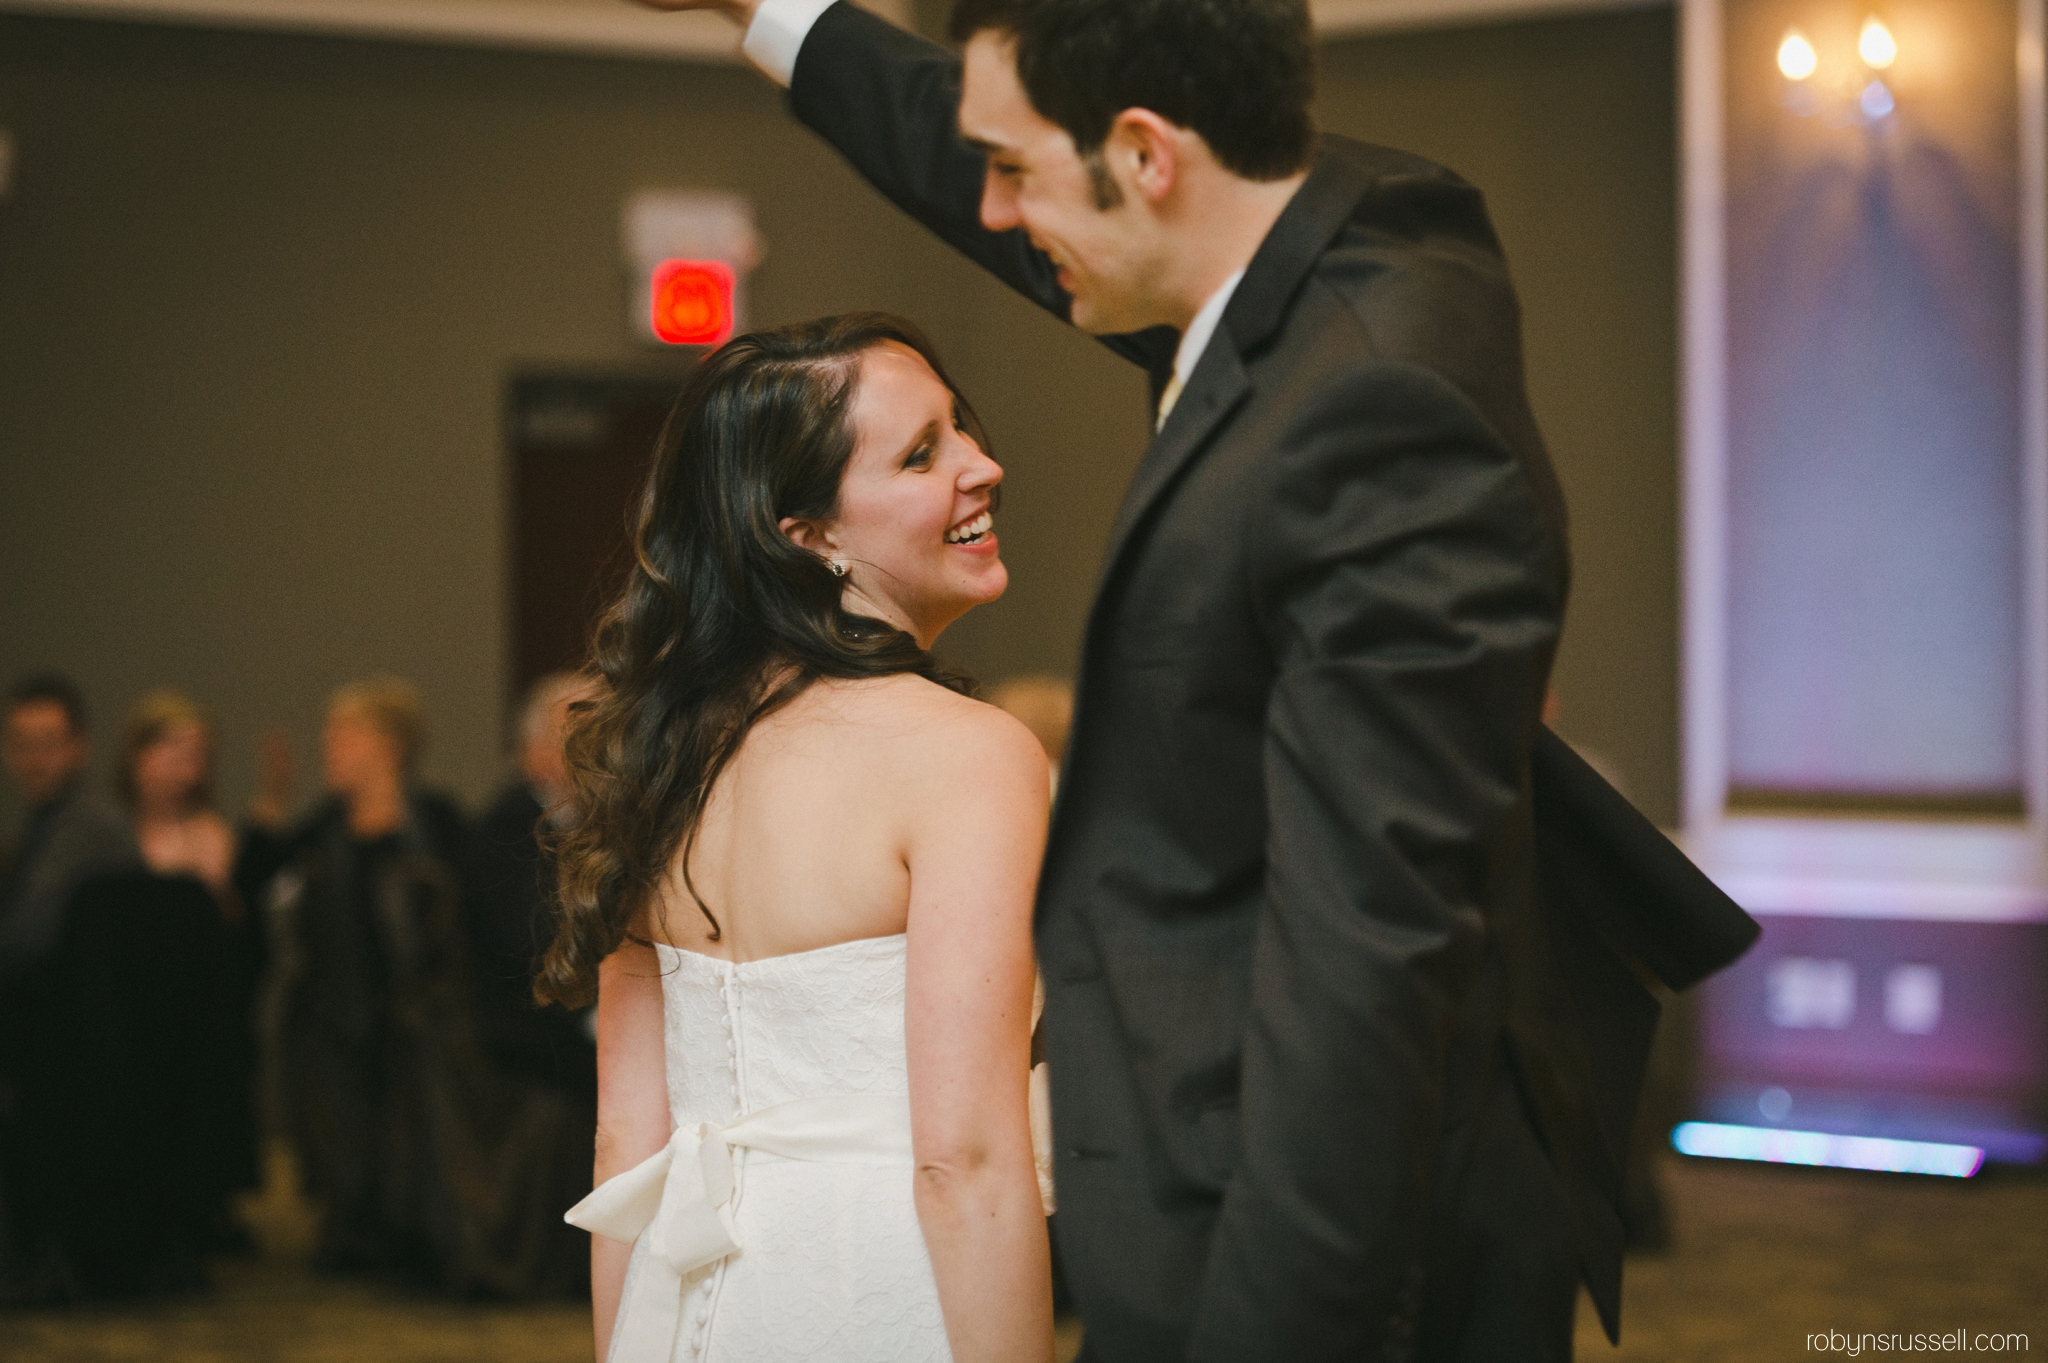 67-bride-and-groom-at-wedding-dance-reception.jpg